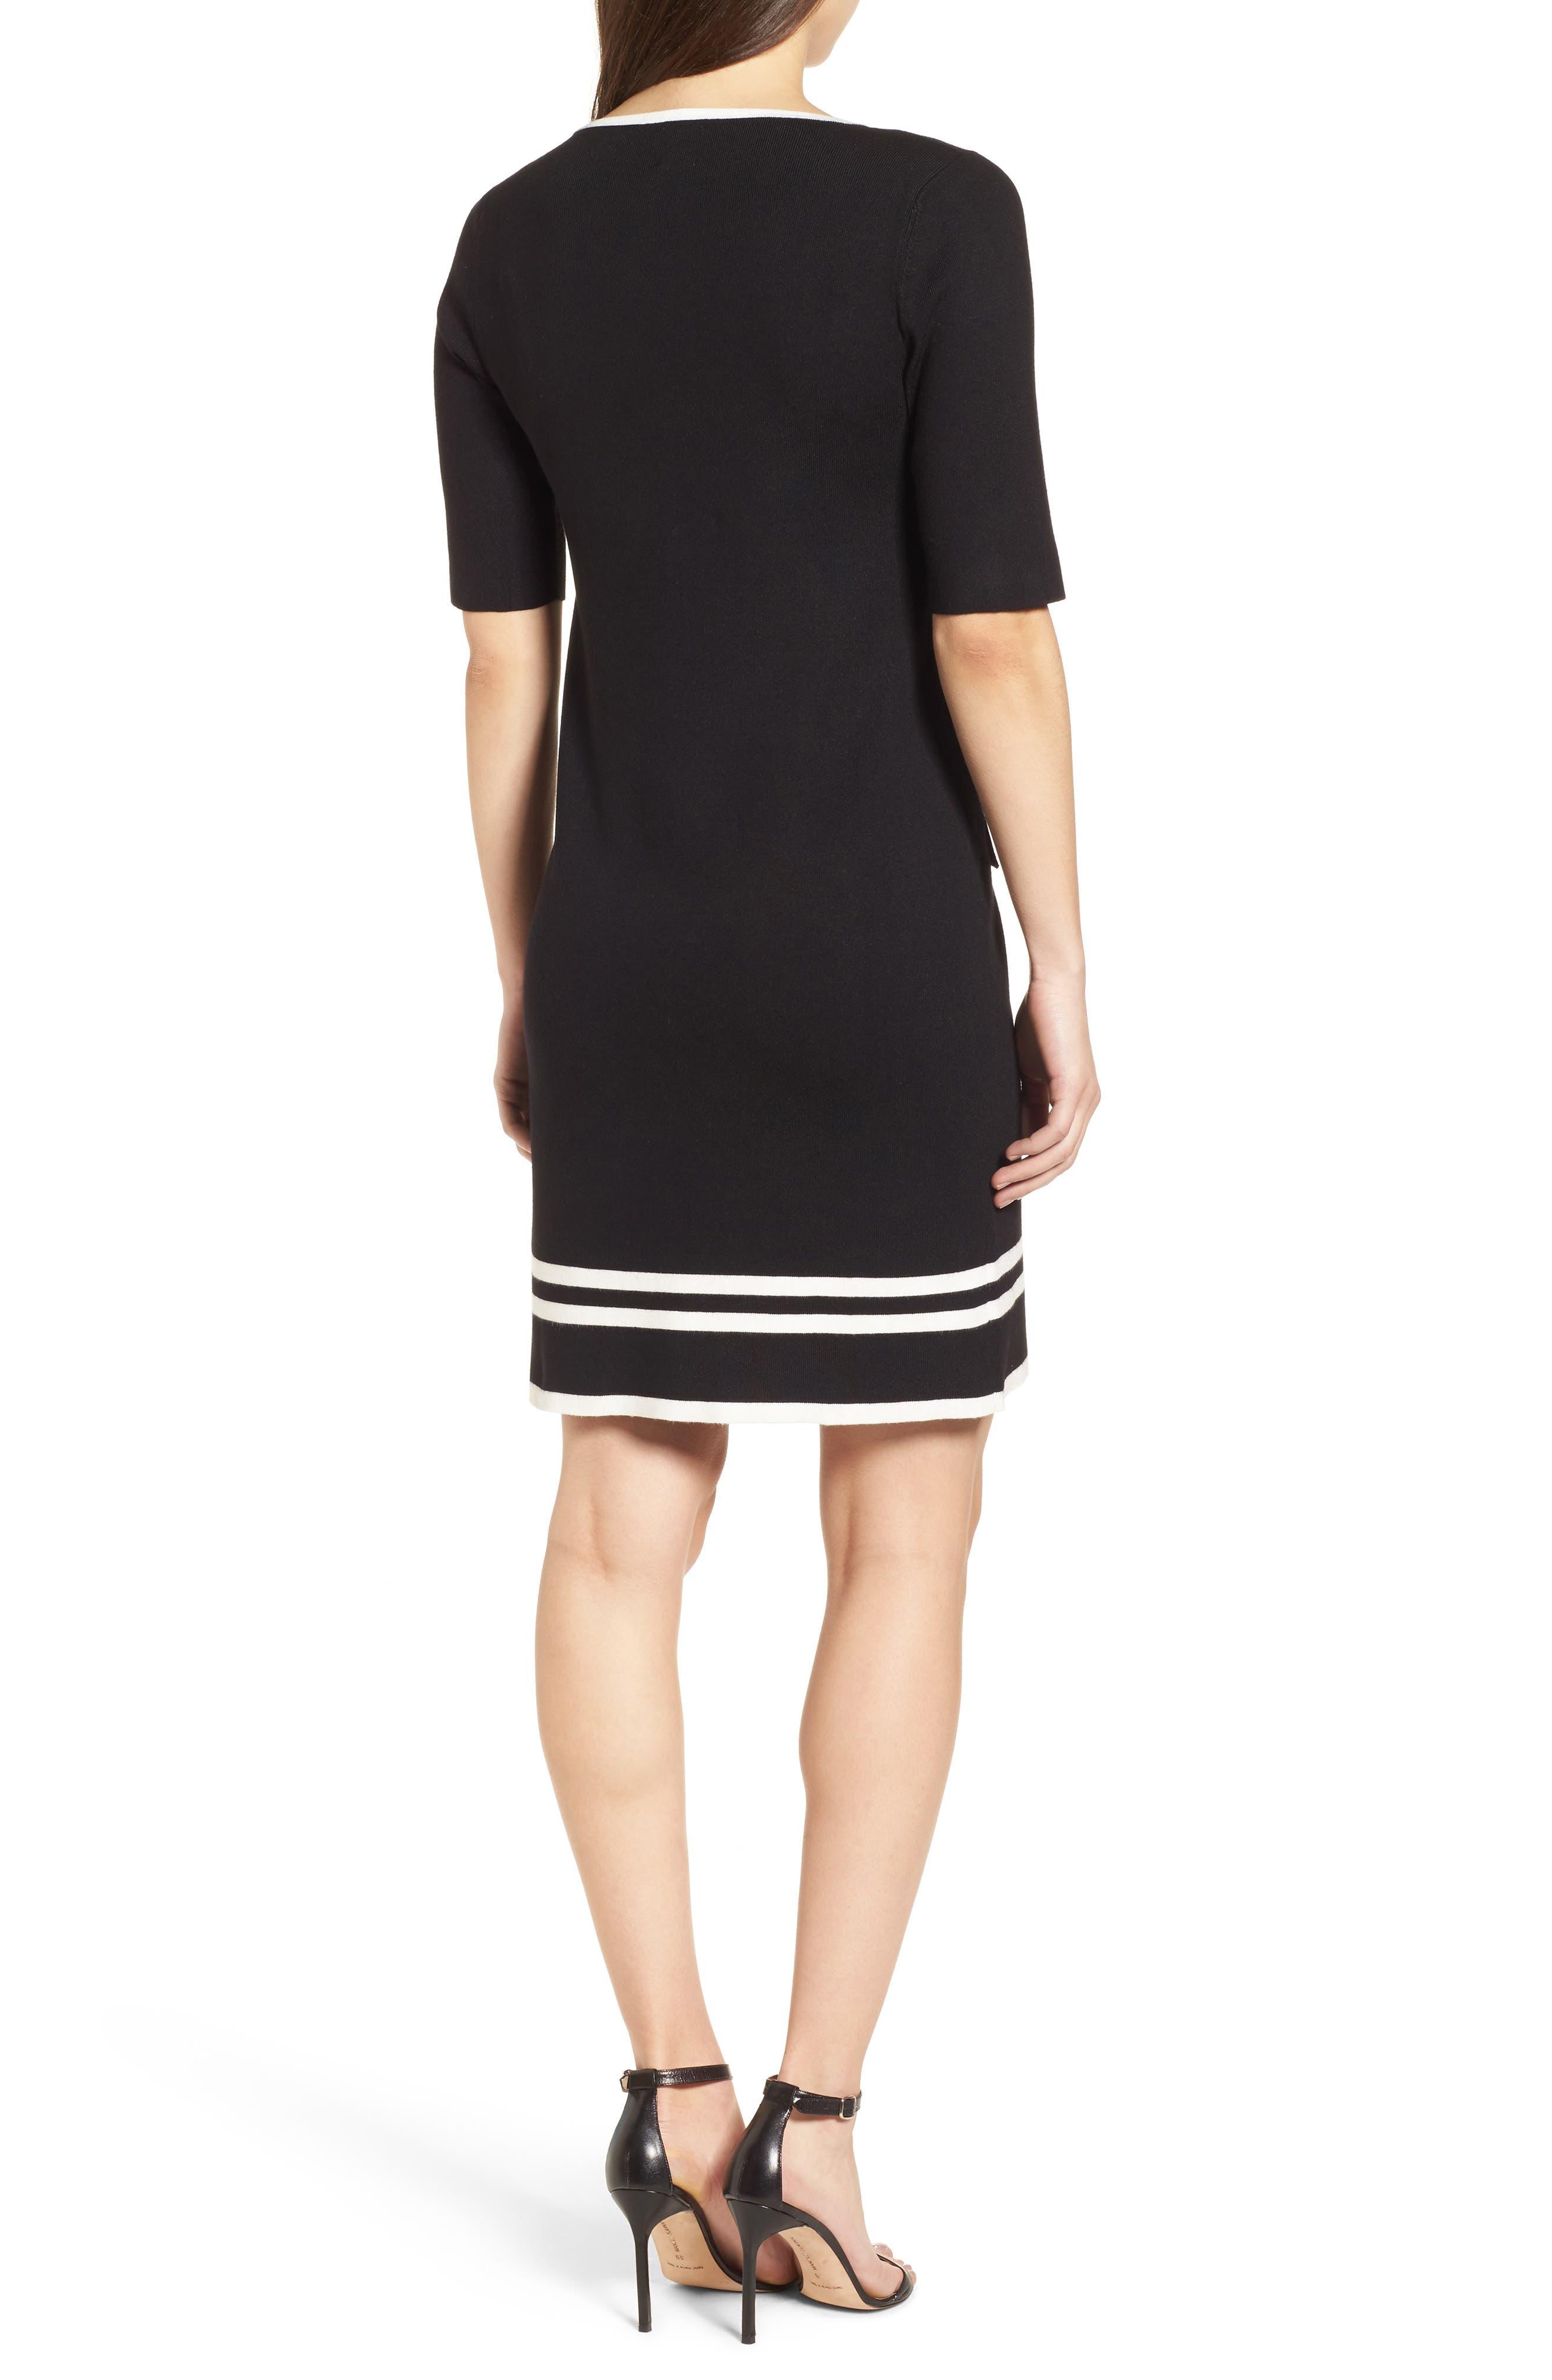 Ann Klein New York Stripe Border Knit Sheath Dress,                             Alternate thumbnail 2, color,                             Black/ White